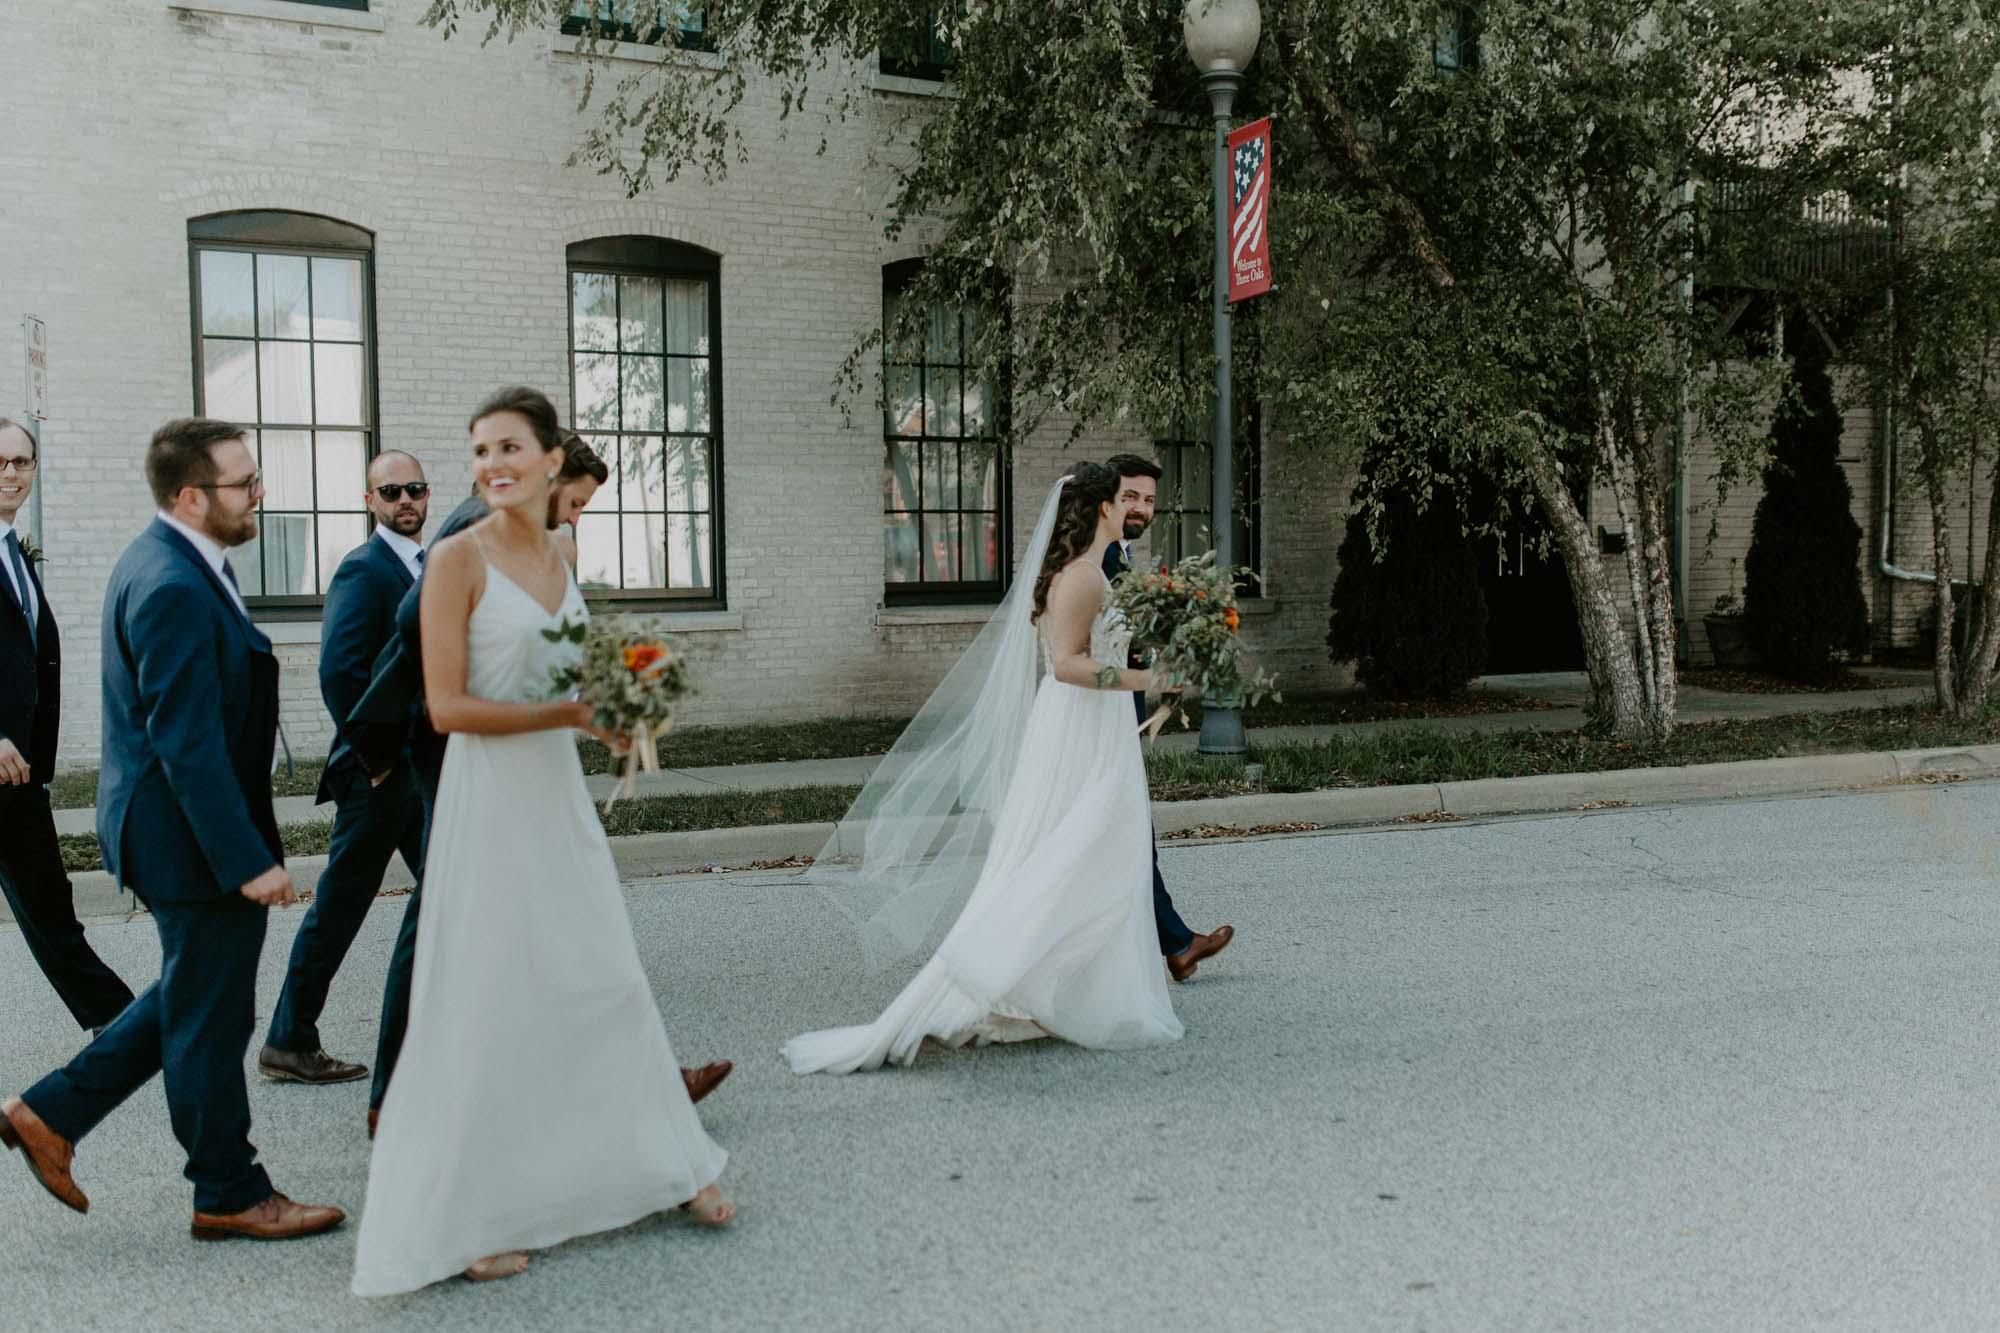 journeyman_distillery_wedding_photographer_chicago_il_wright_photographs-4010.jpg